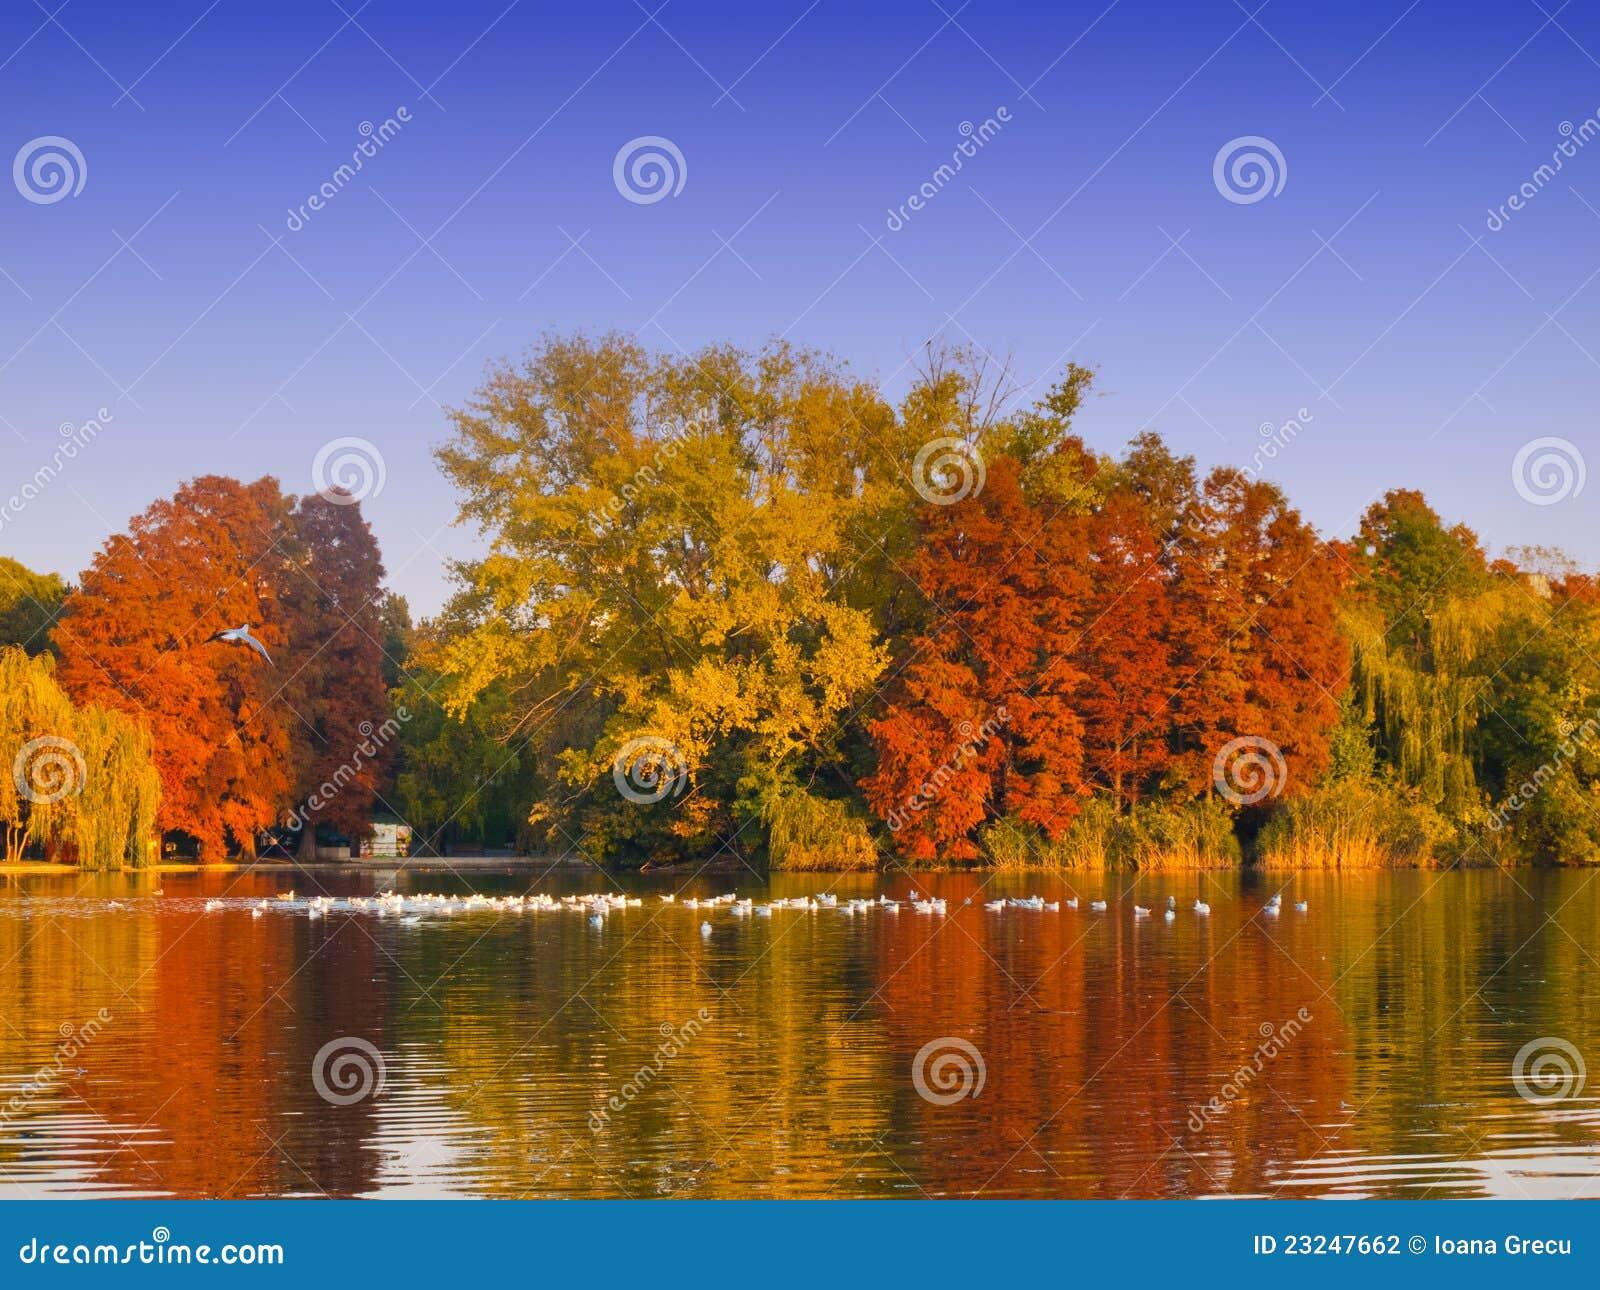 Colorful autumn trees and lake